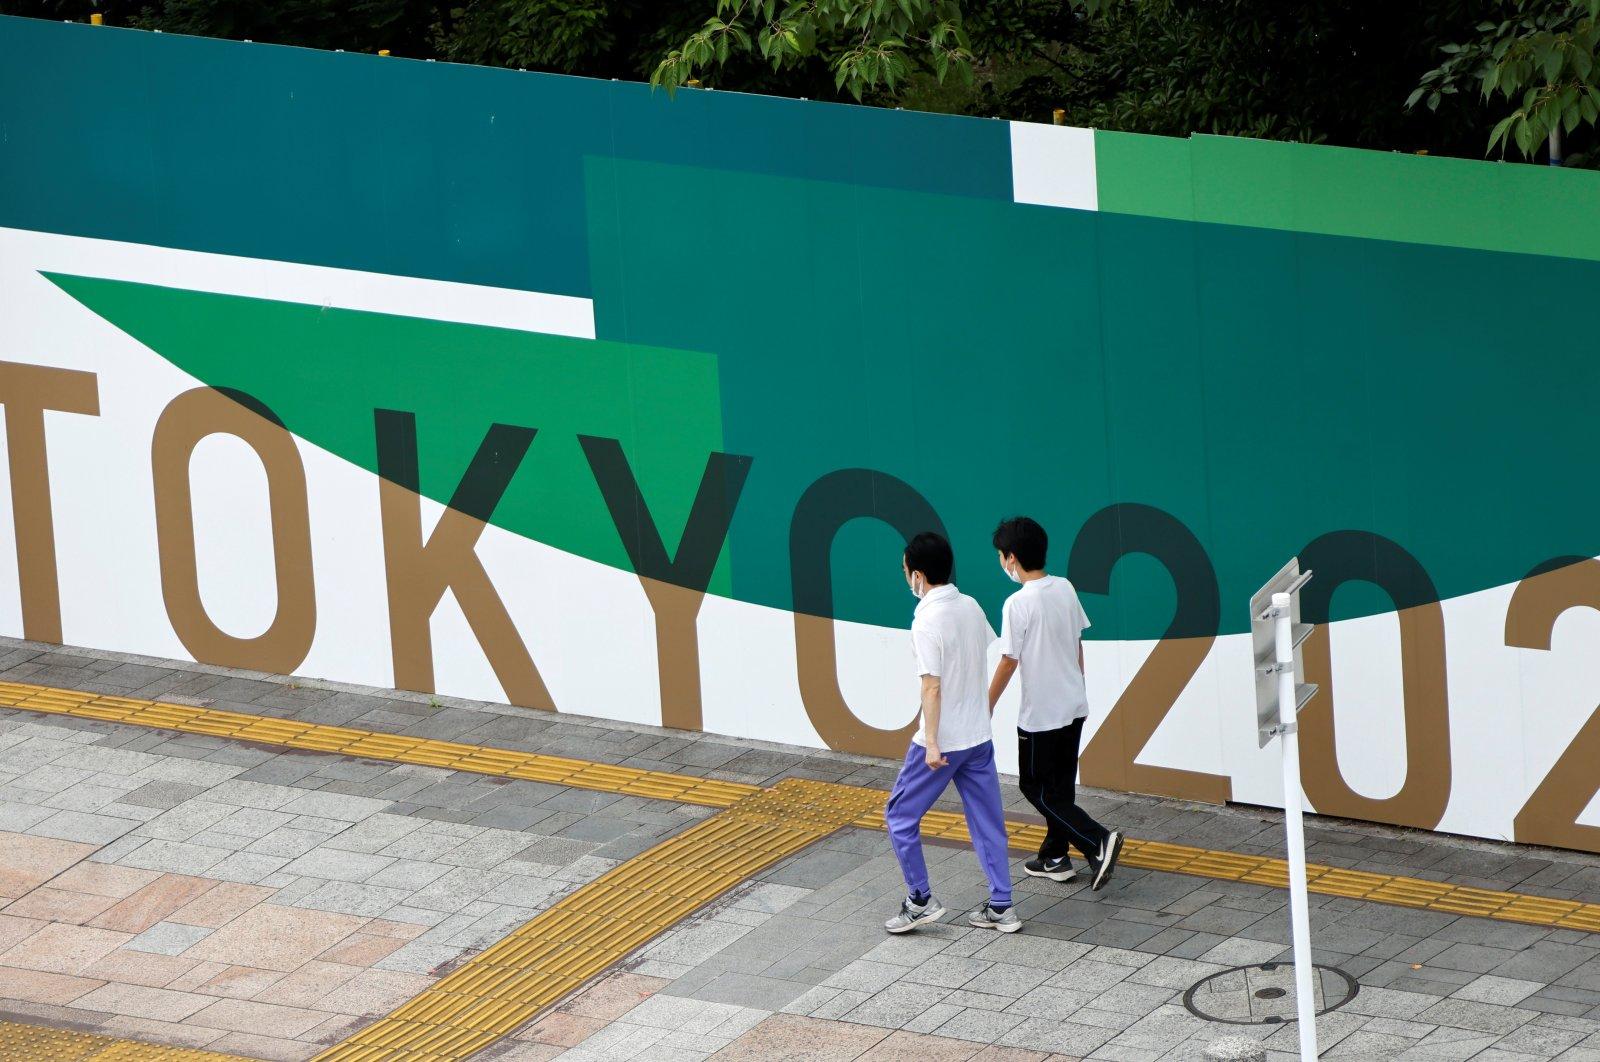 People walk past 2020 Tokyo Olympic Games advertisement banners in Tokyo, Japan, June 27, 2021. (Reuters Photo)